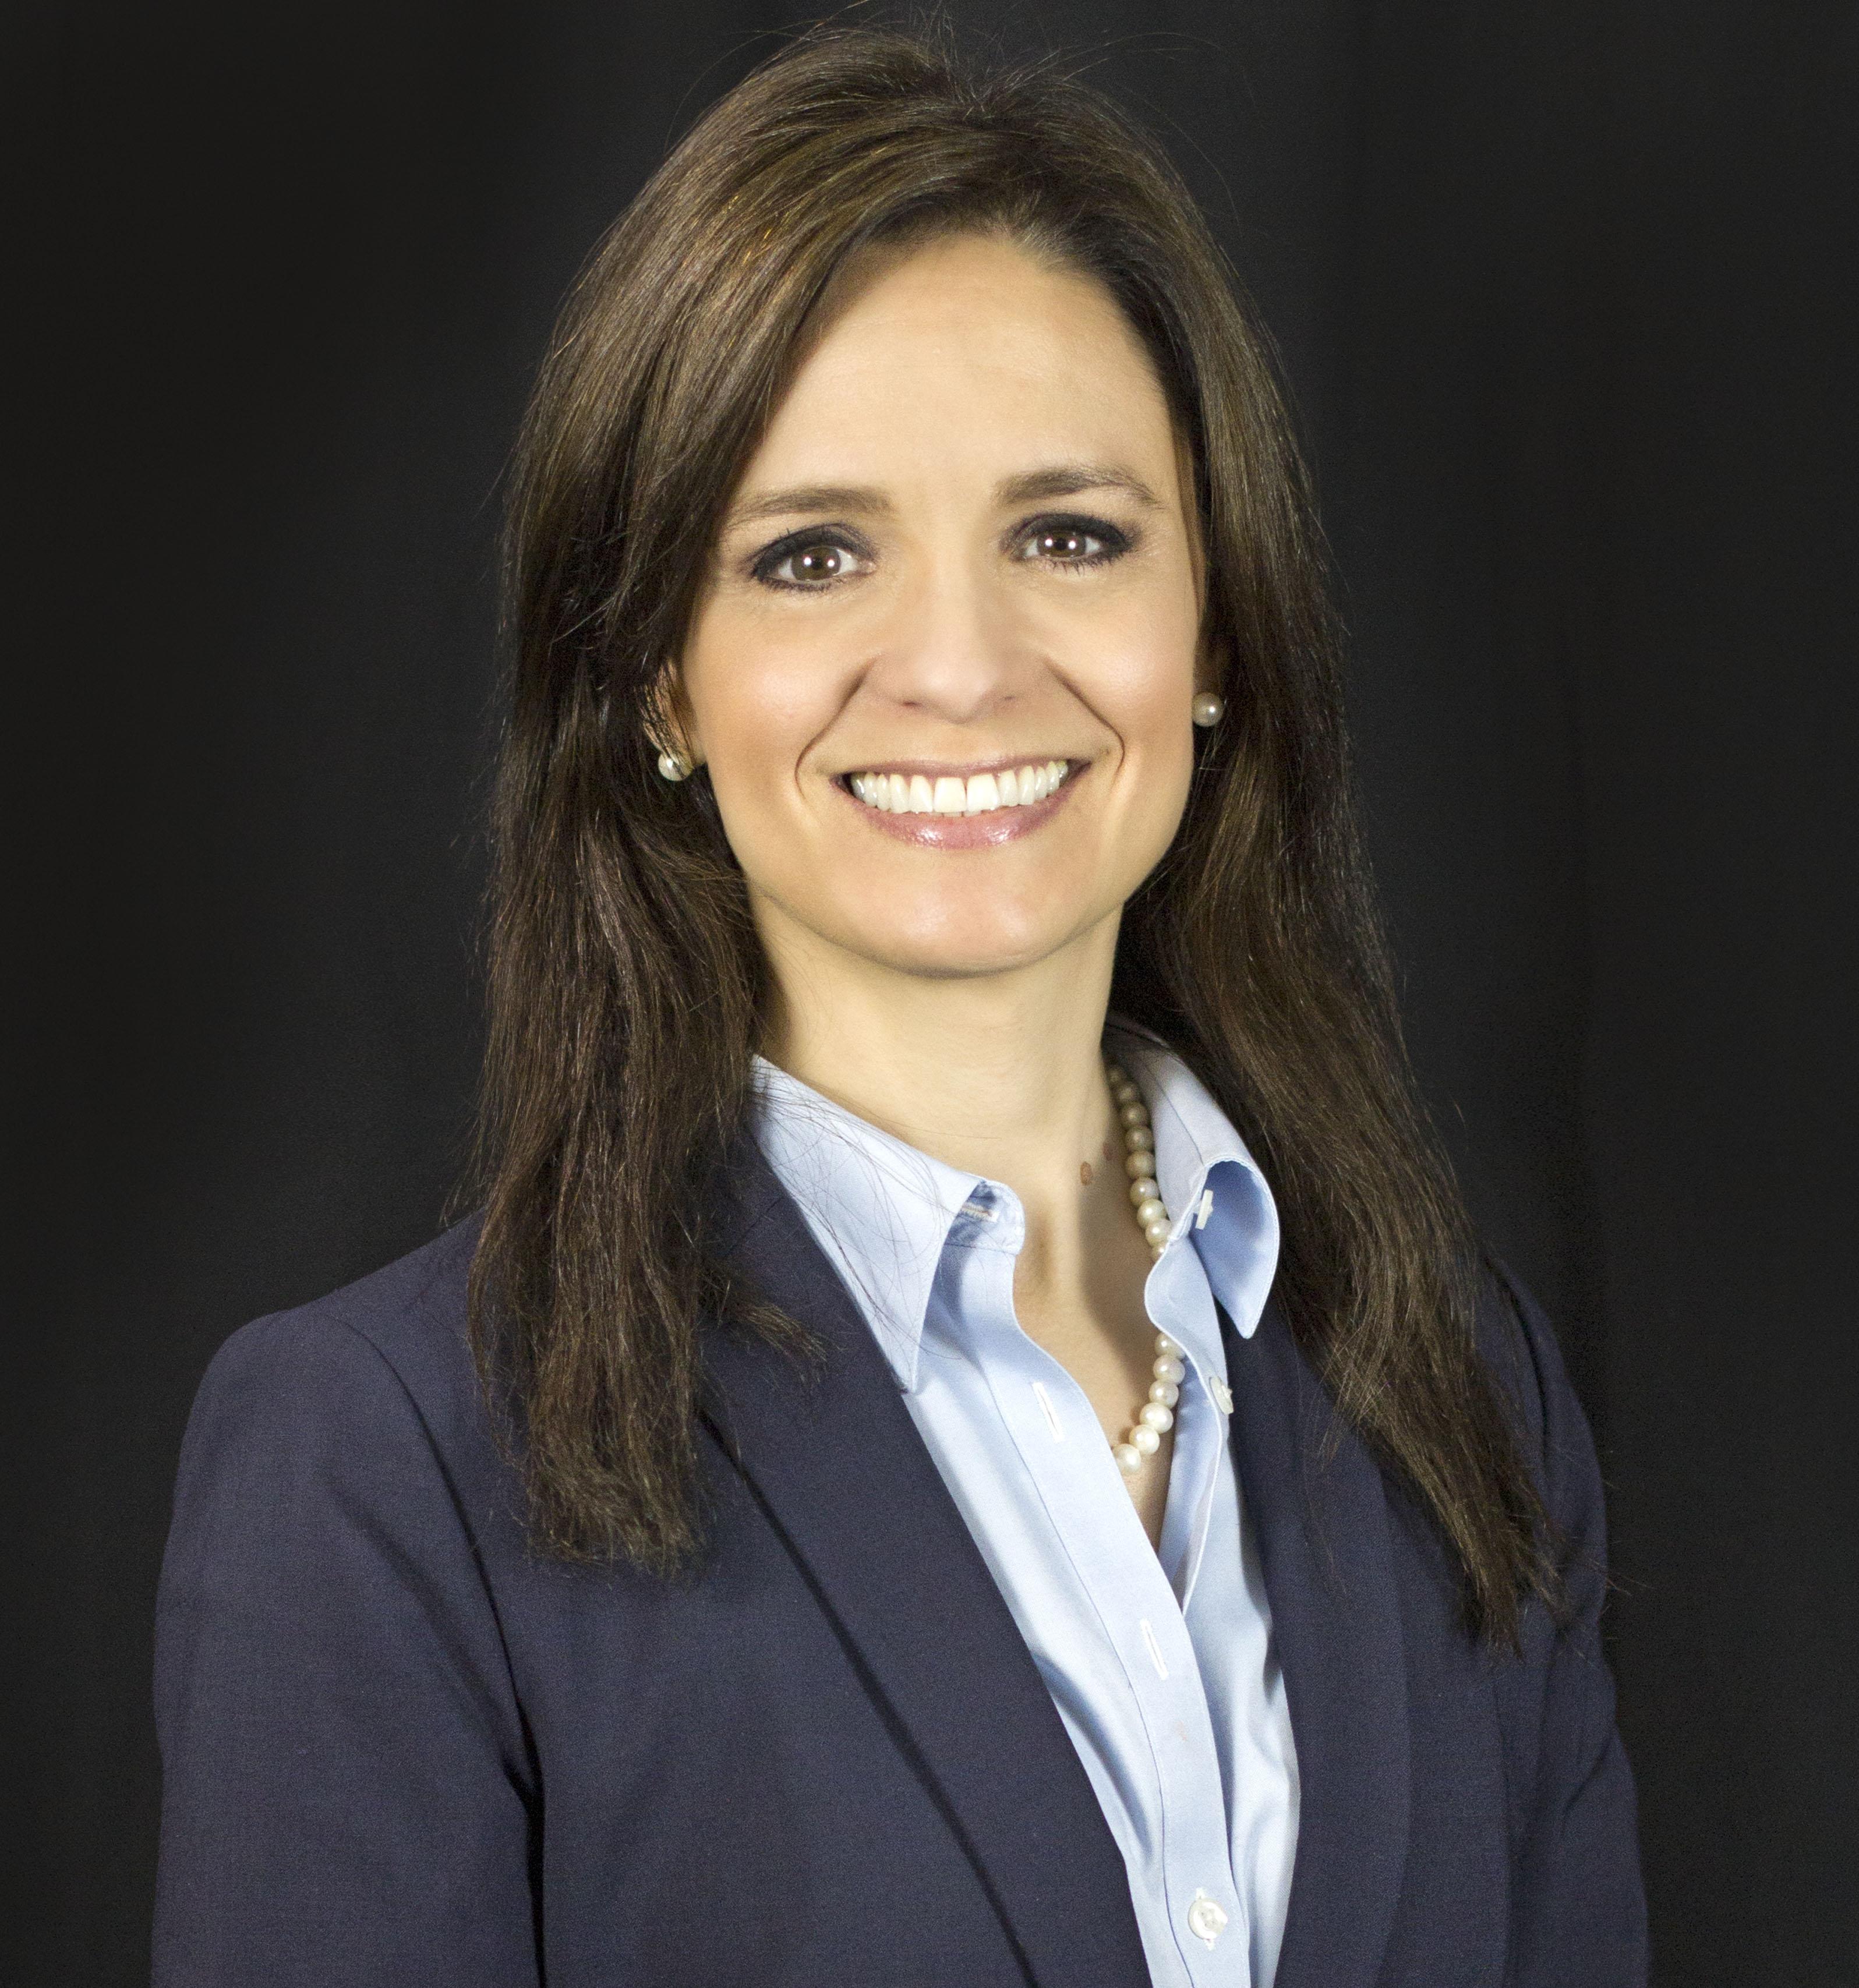 Kristin Garris